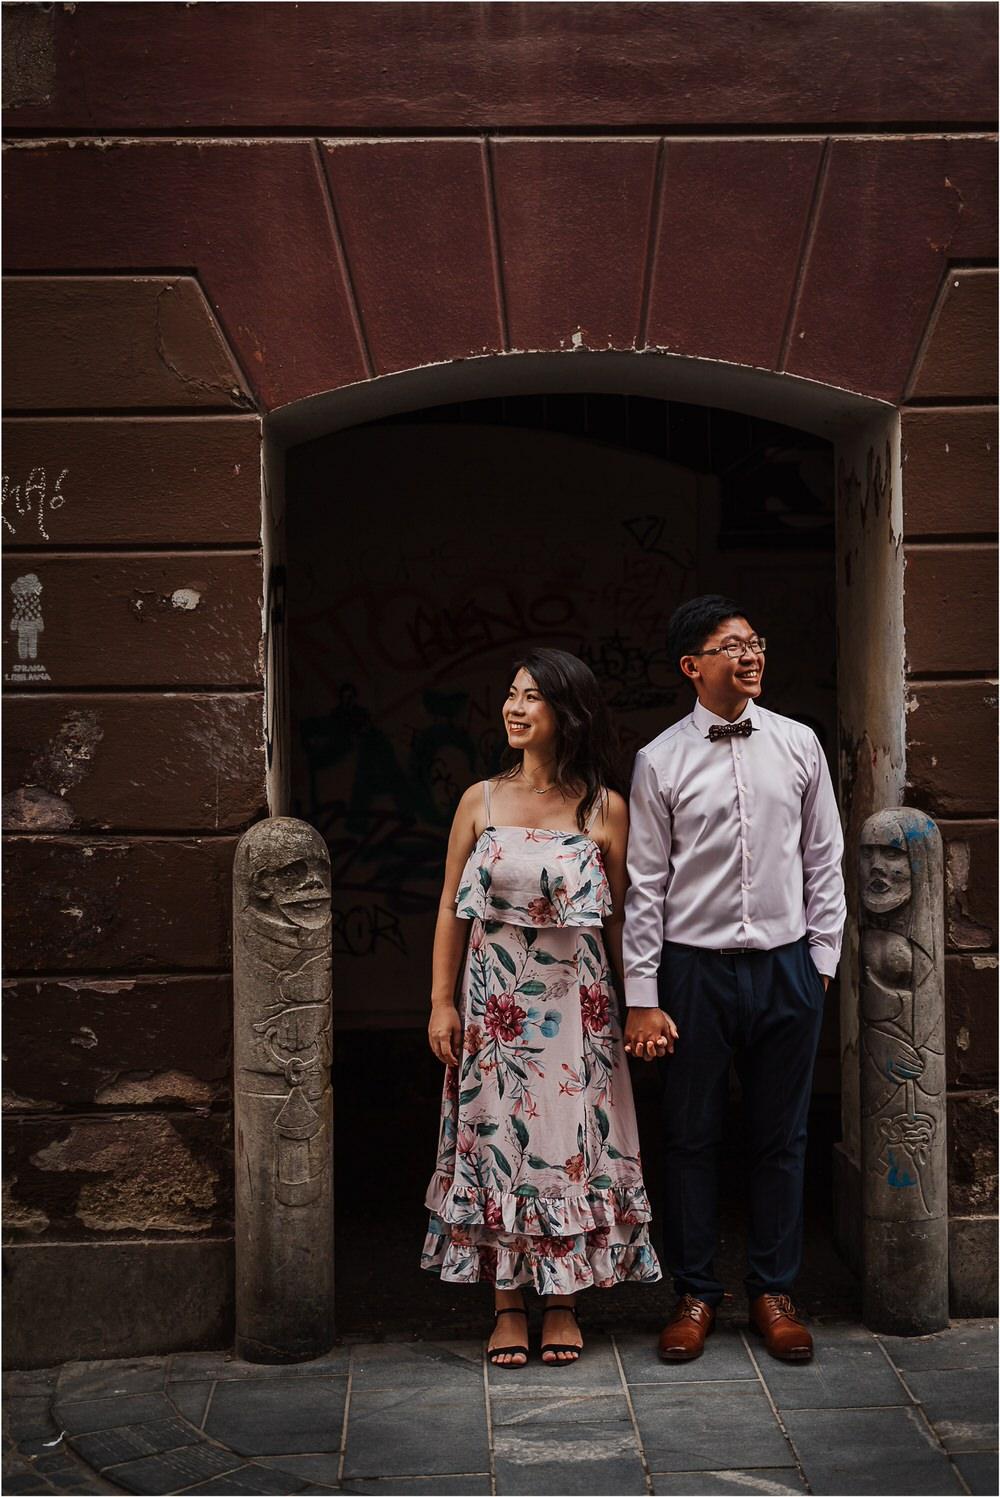 prewedding bled lake slovenia asian couple ljubljana engagement singapore love bohinj lake 0022.jpg